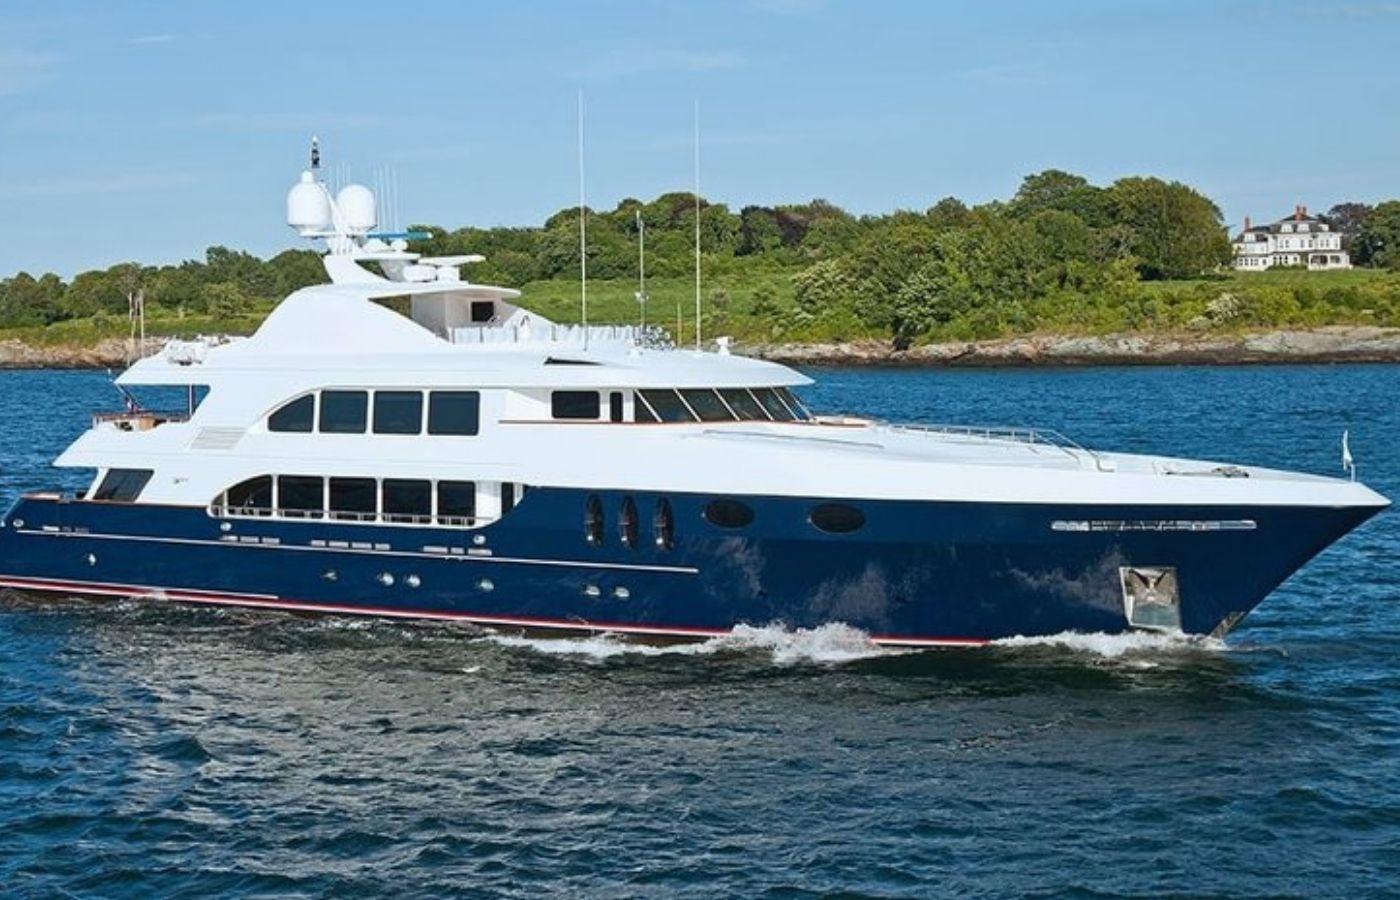 157 Trinity Yachts Sold By Bruce Schattenburg